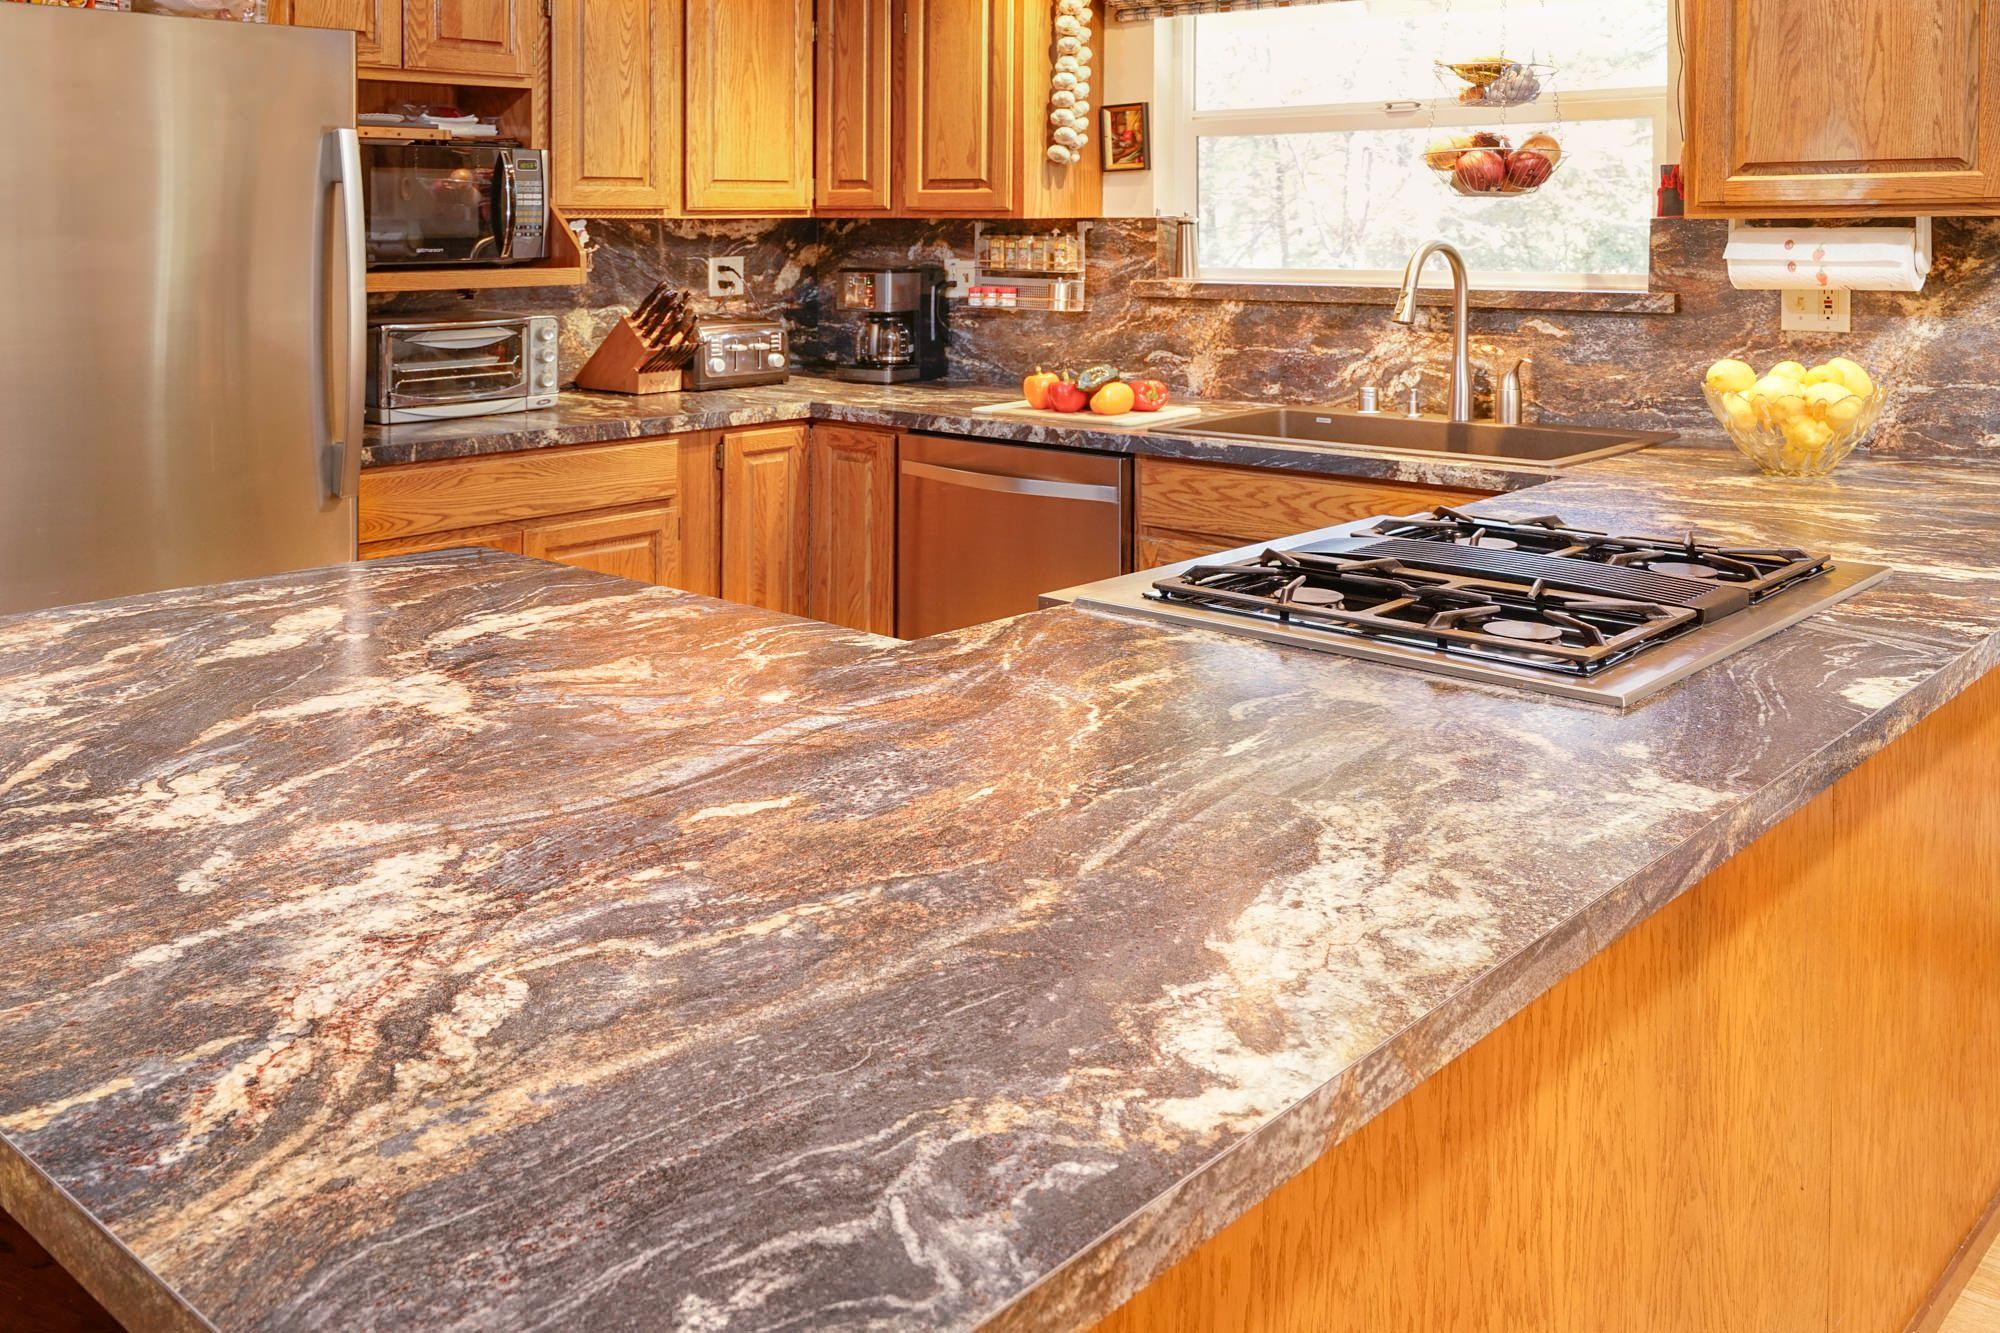 Blue Kitchen Countertops Oak Cabinet Doors Formica Fx180 Storm For The Home Pinterest